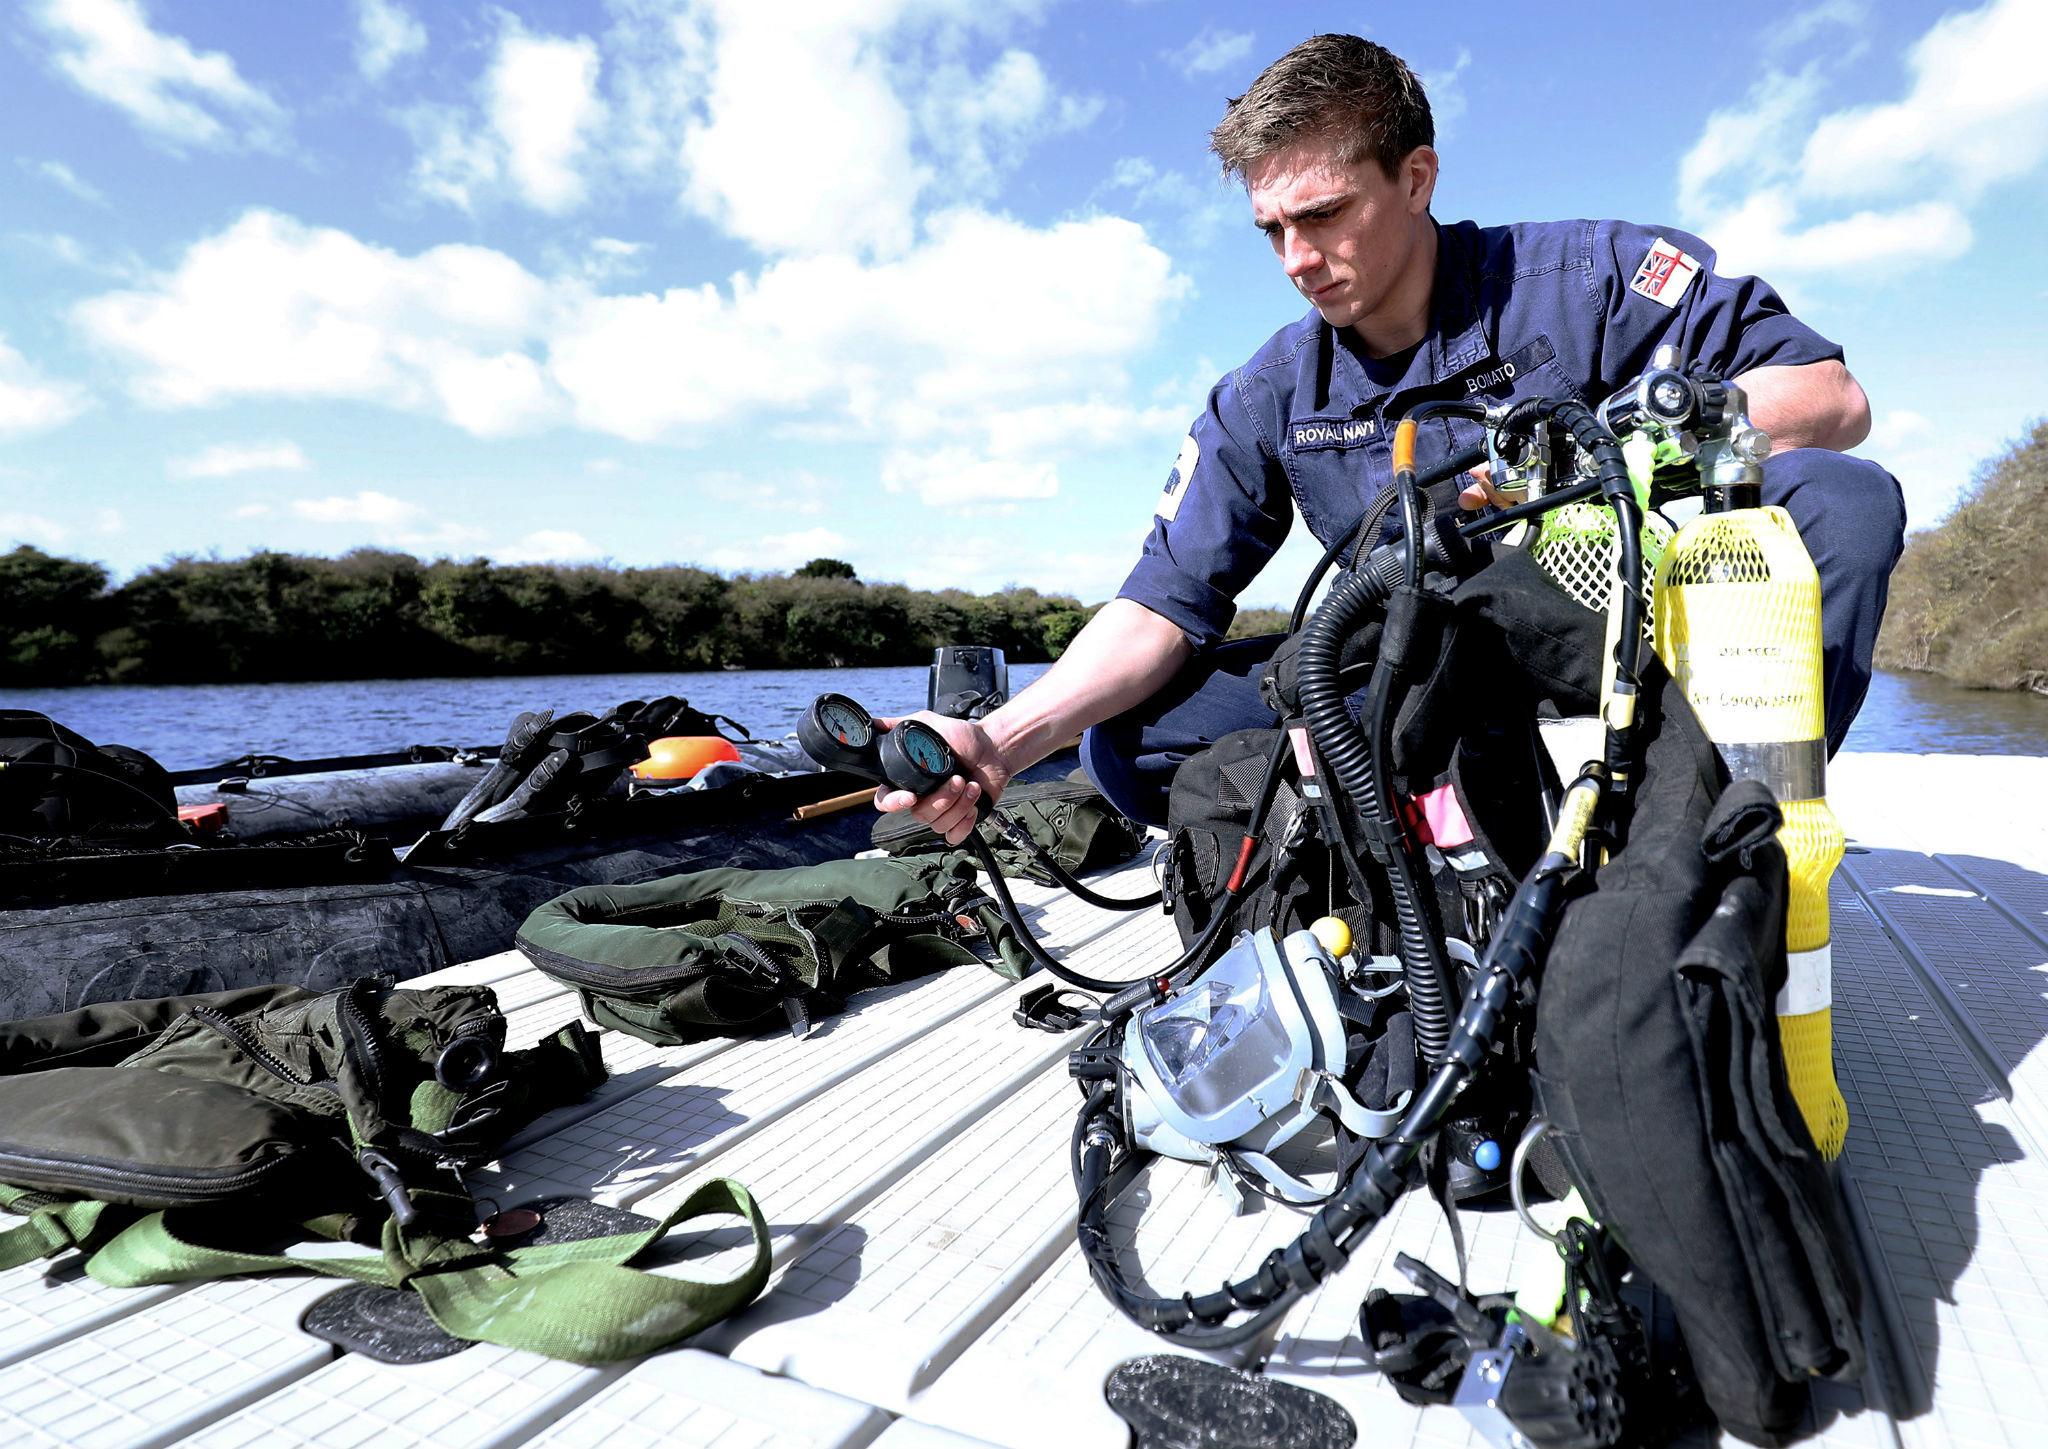 TYOK Alex Bonato bomb disposal diver